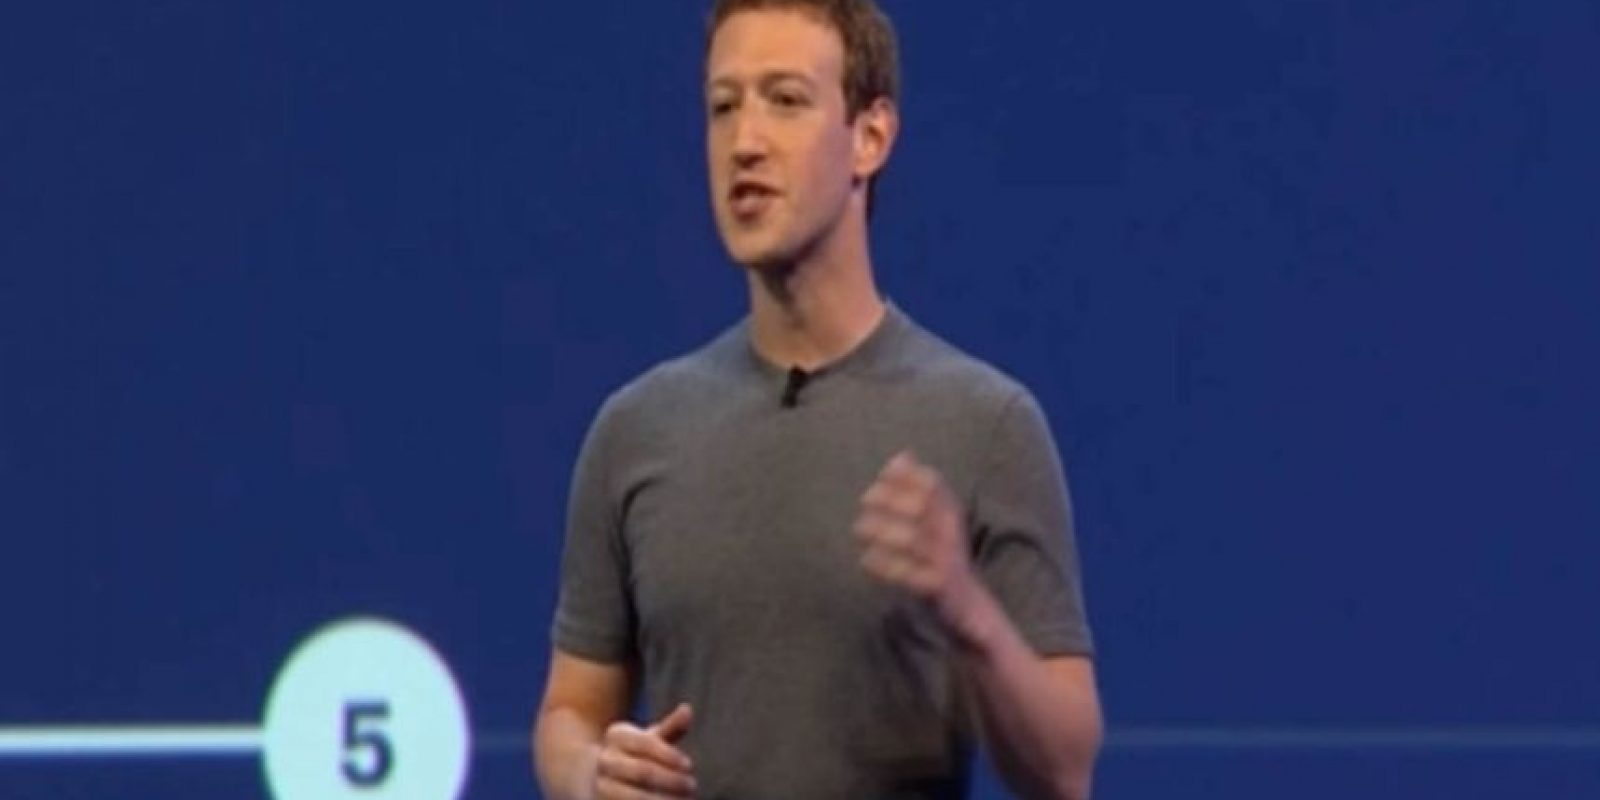 En ella, Mark Zuckerberg anunció los bots para Facebook Messenger. Foto:F8